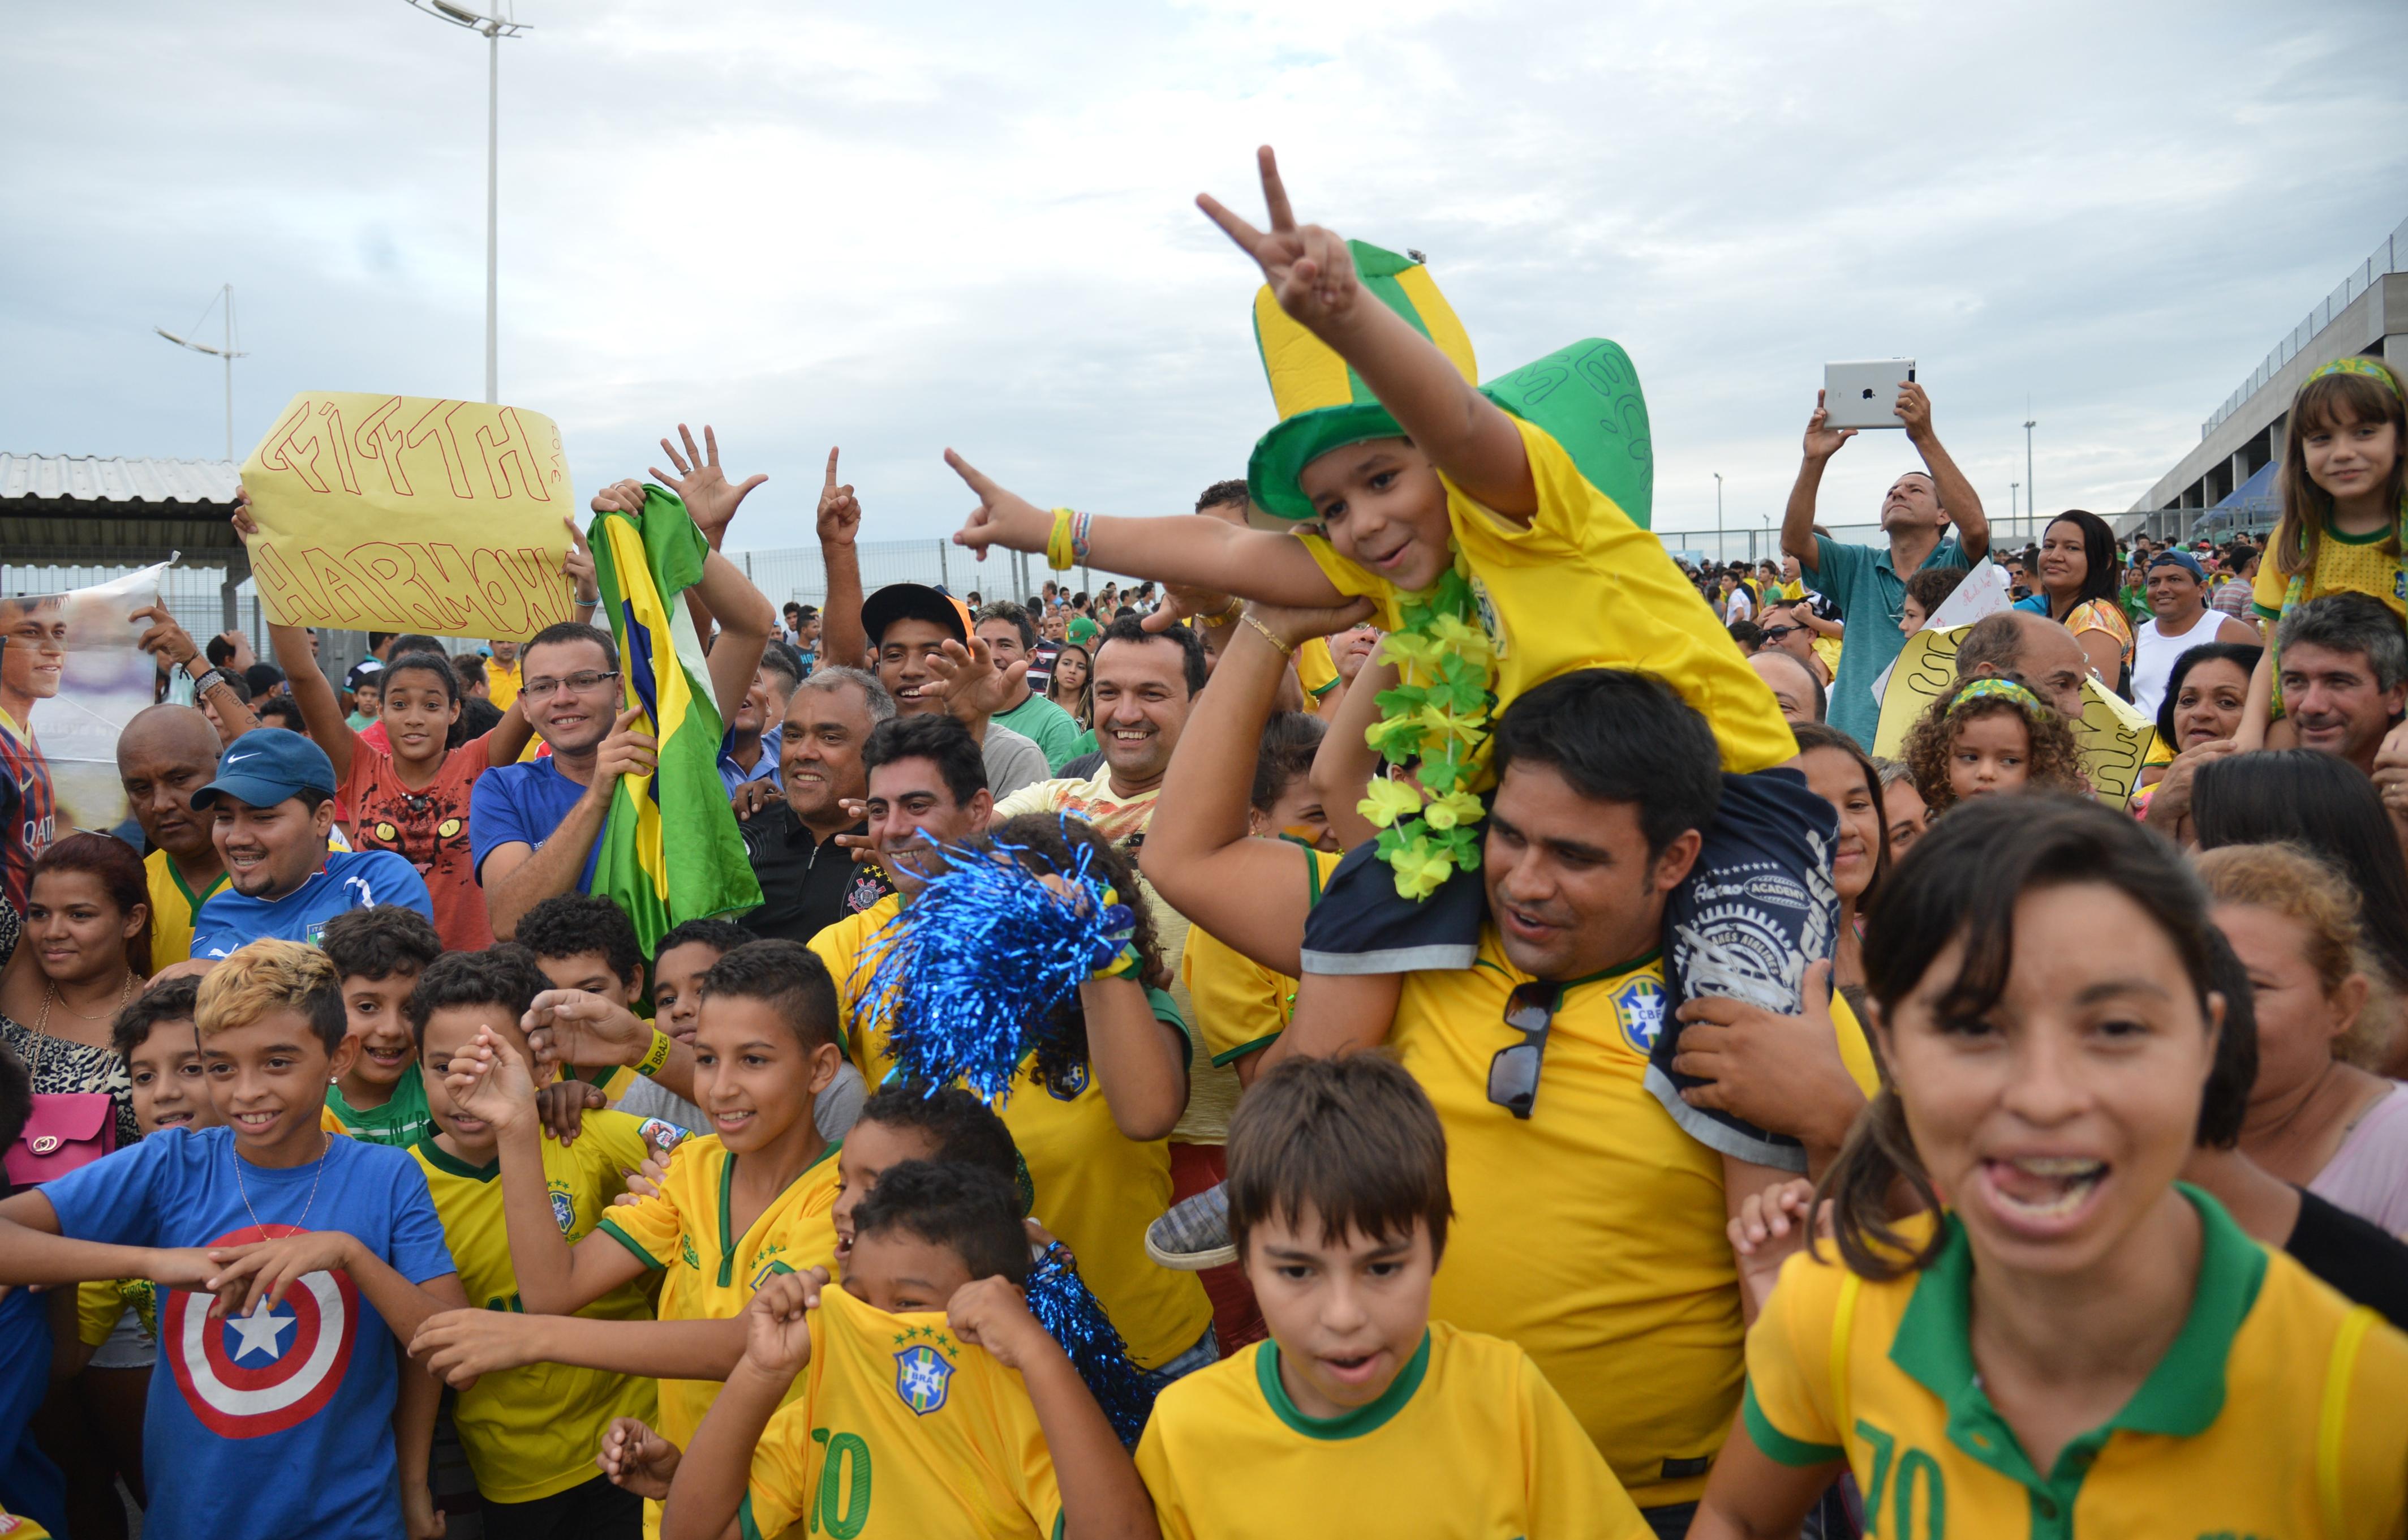 jogo torcida brasileira na copa pretty